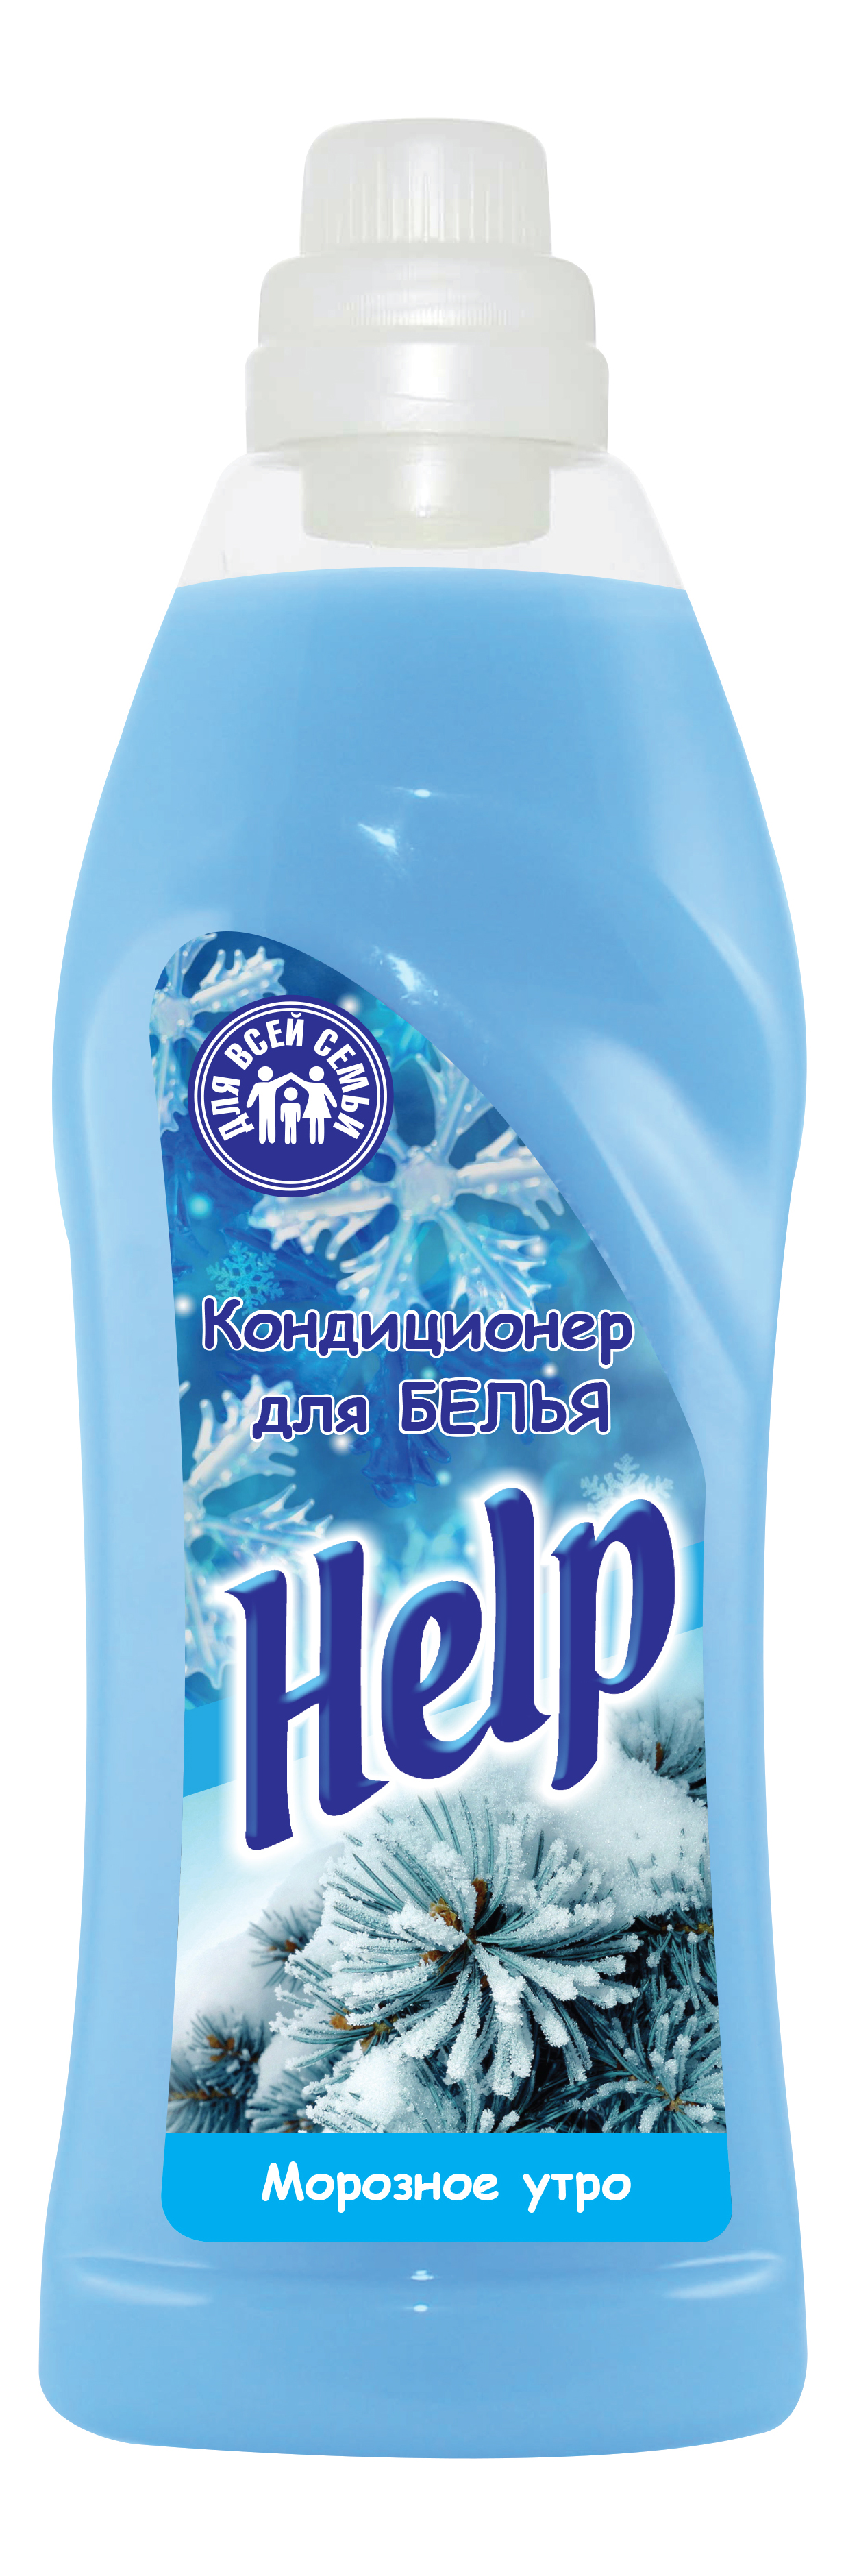 Ополаскиватель для белья Help морозное утро